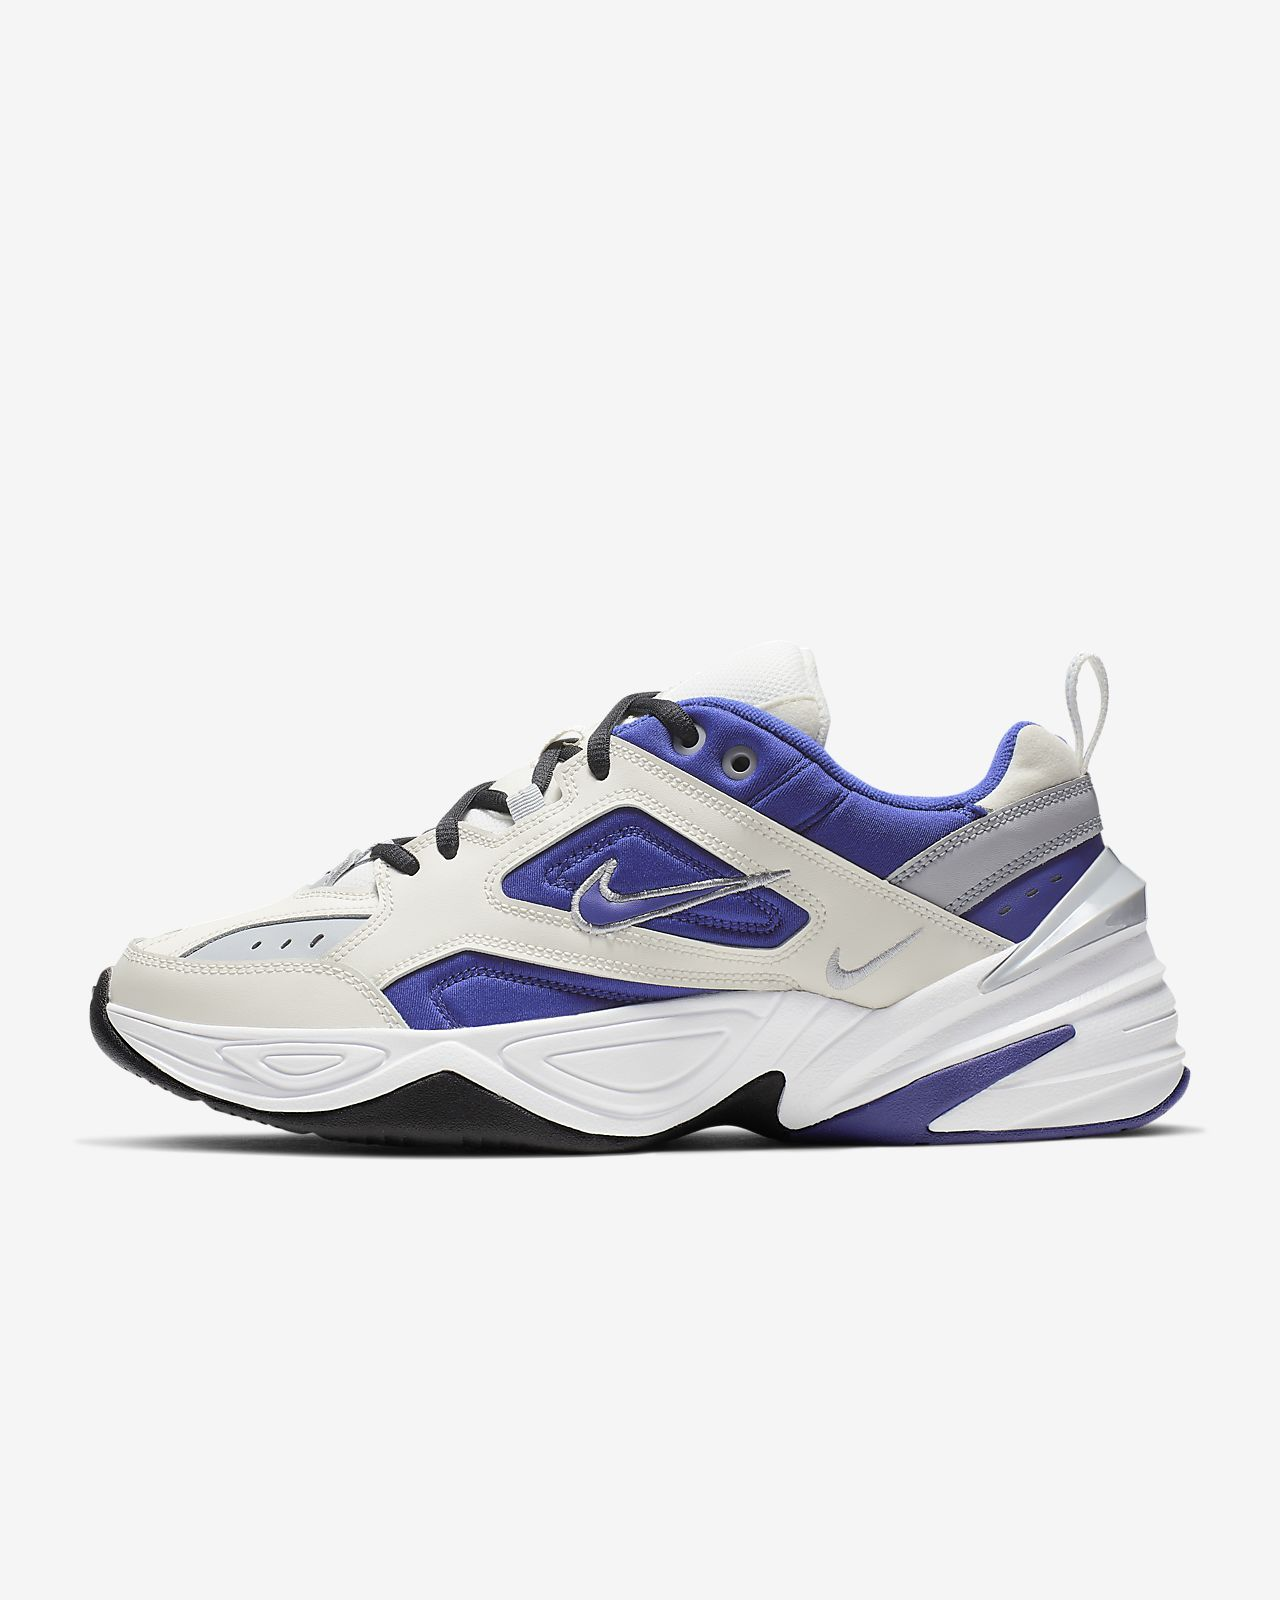 3848d1f297cad Nike M2K Tekno Men's Shoe